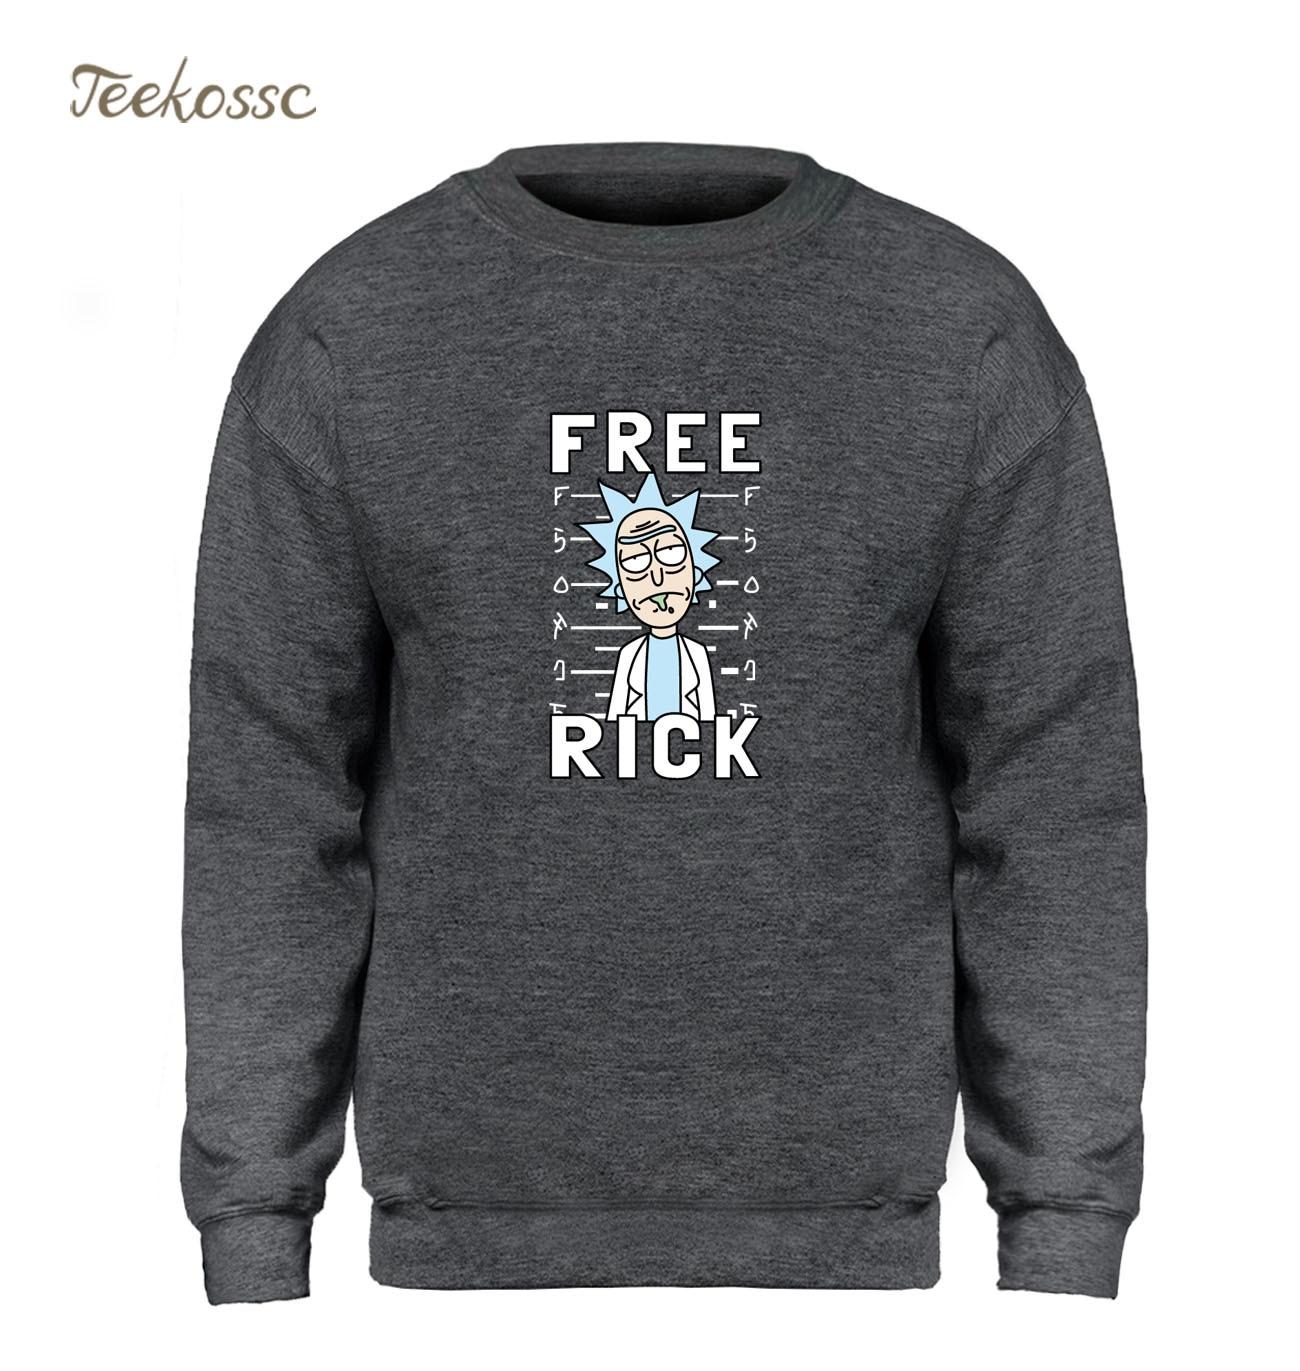 Rick and Morty Hoodie Free Rick Sweatshirt Men Funny Slim Sweatshirts 2018 Winter Autumn Fleece Warm Anime Balck Gray Streetwear